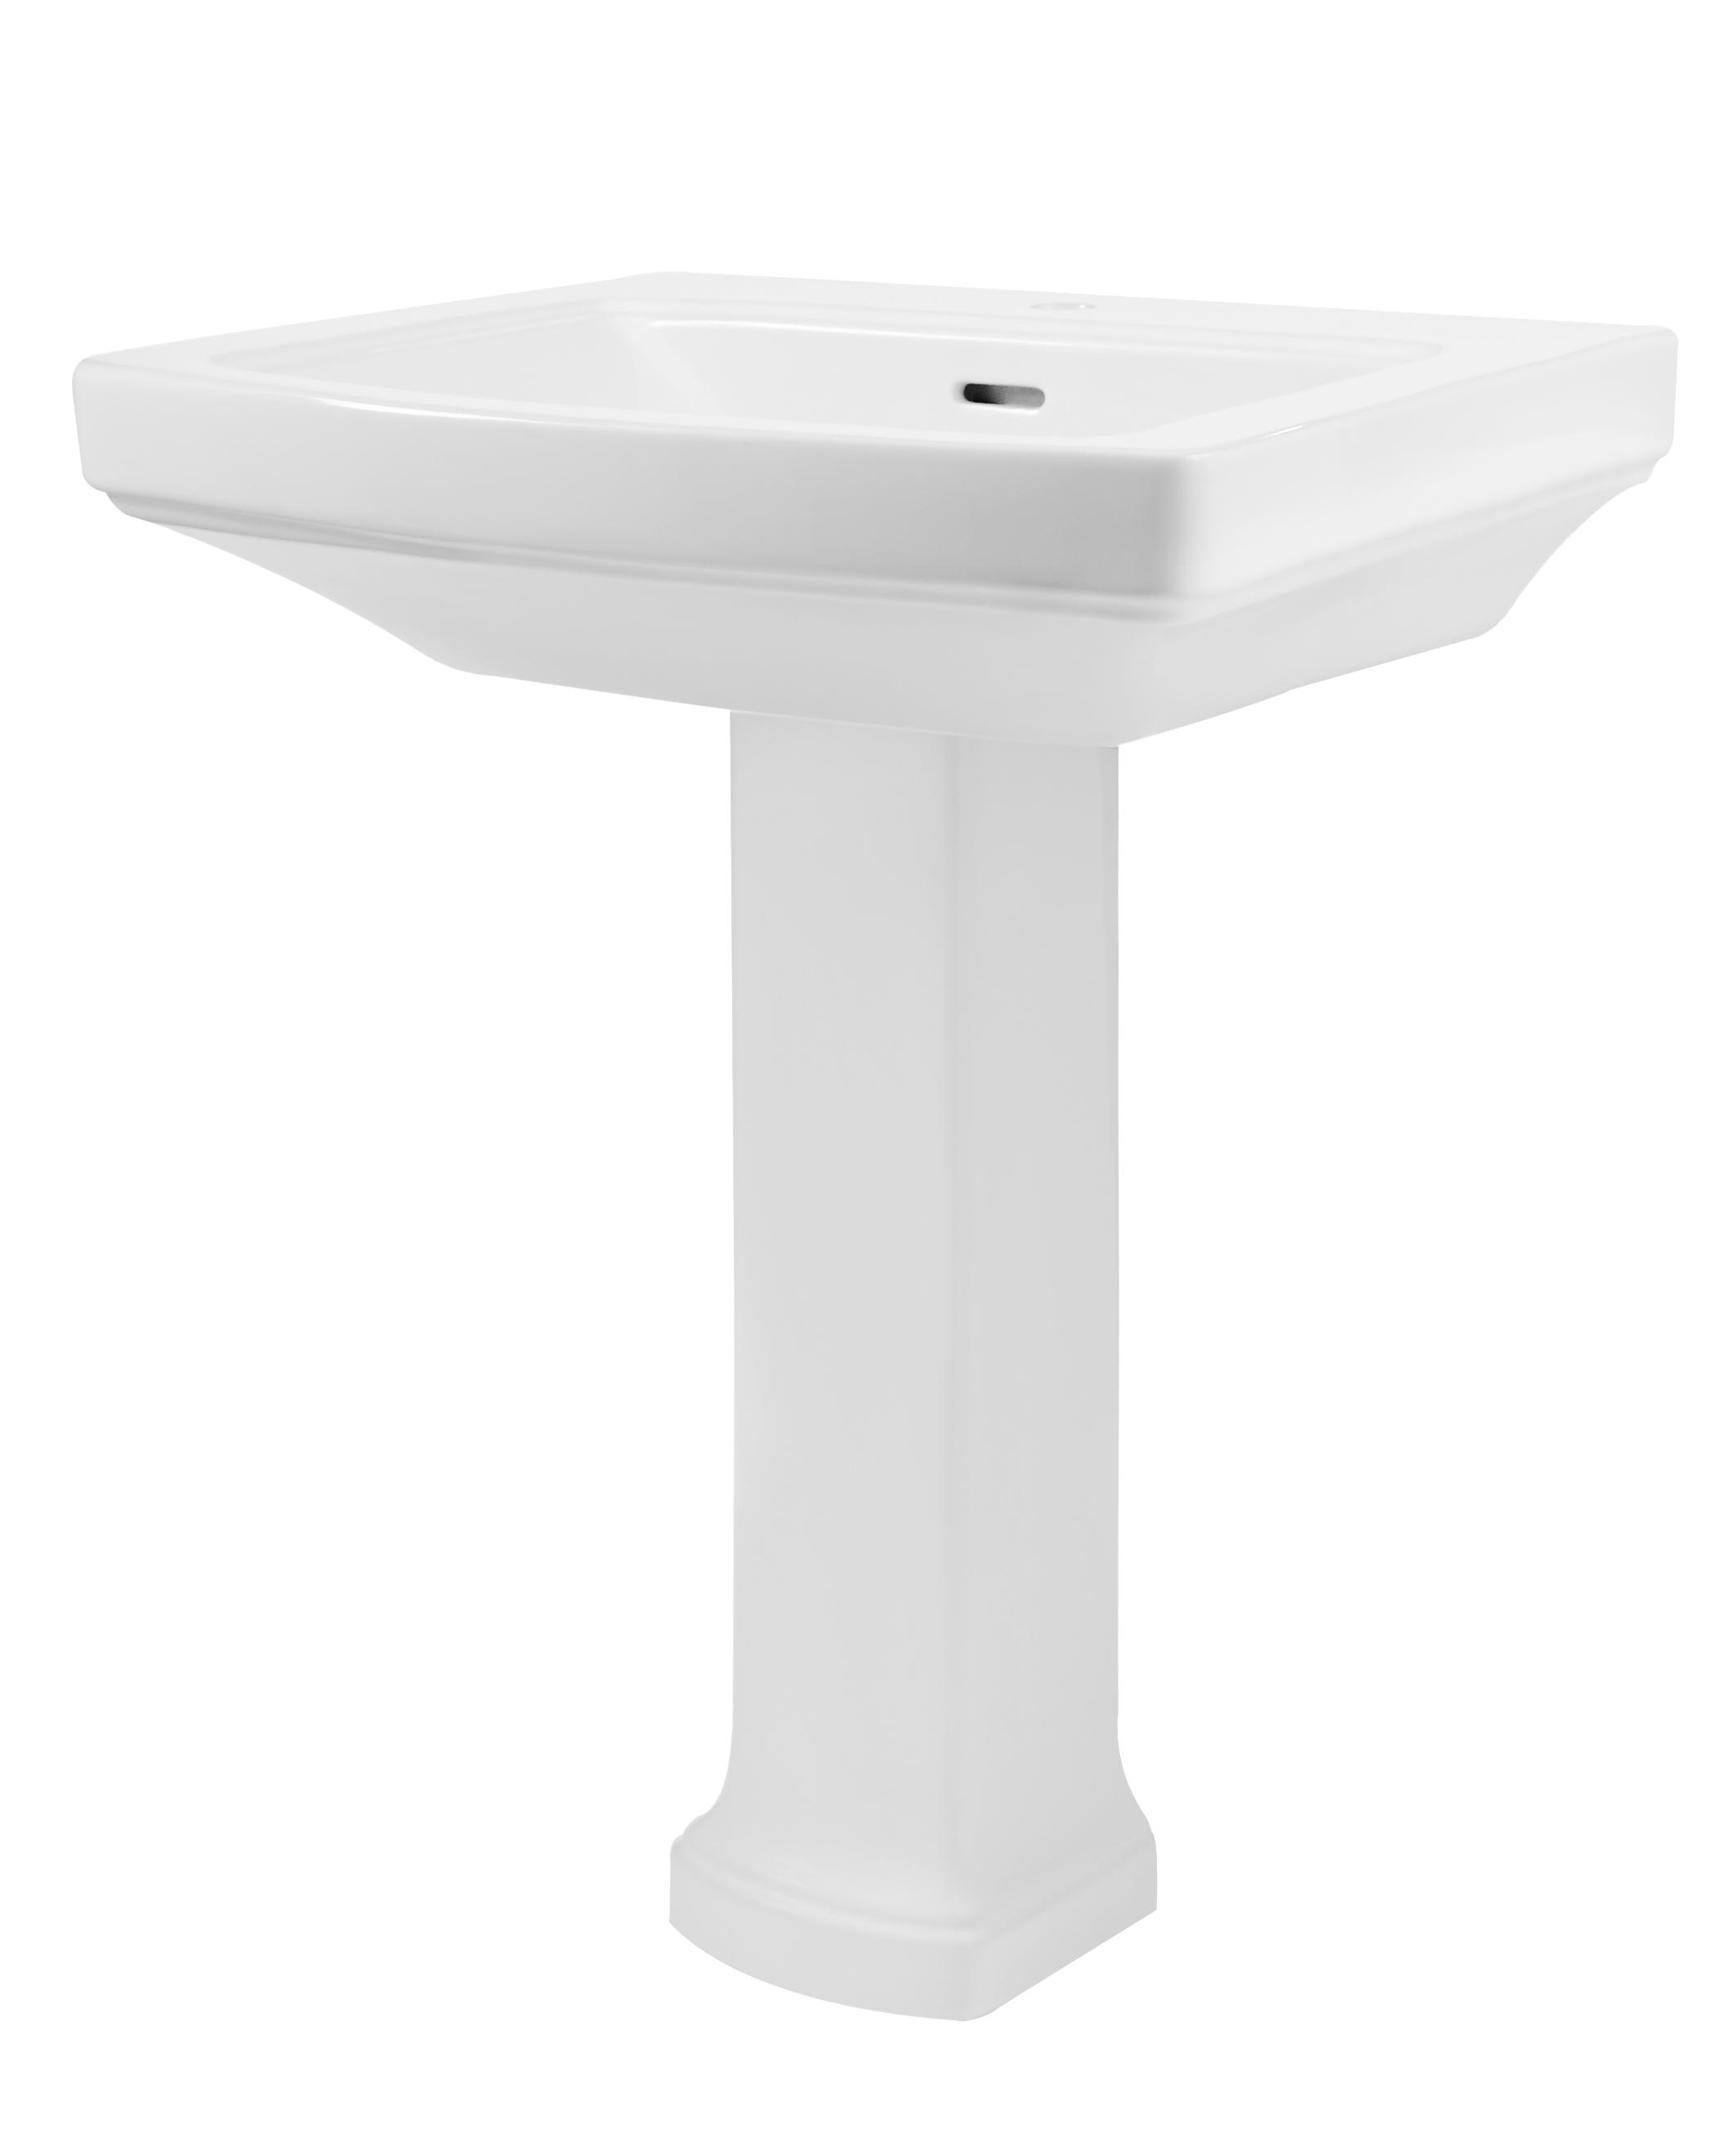 Standard bathroom sink - Hinsdale Single Hole Standard Bathroom Sink With Pedestal Gerber Plumbing